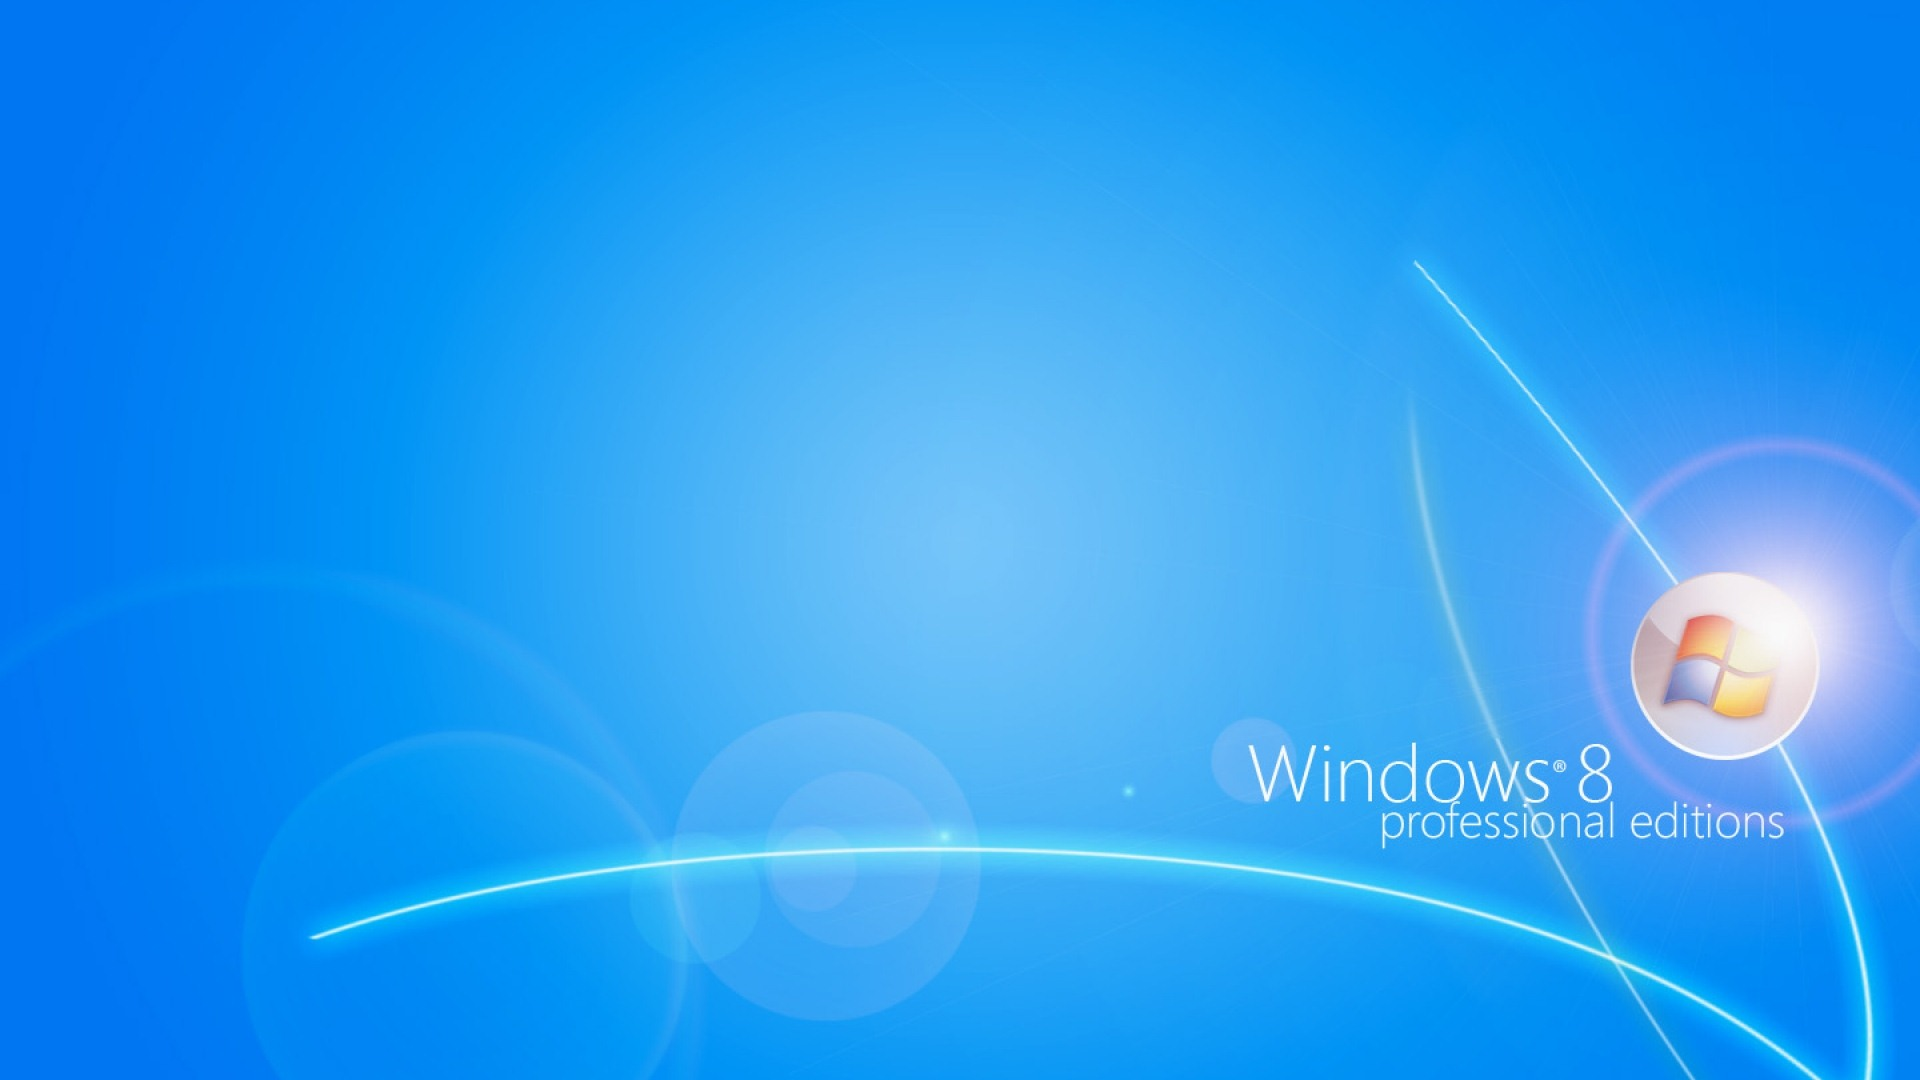 Windowsの8テーマの壁紙(2) #14 - 1920x1080.